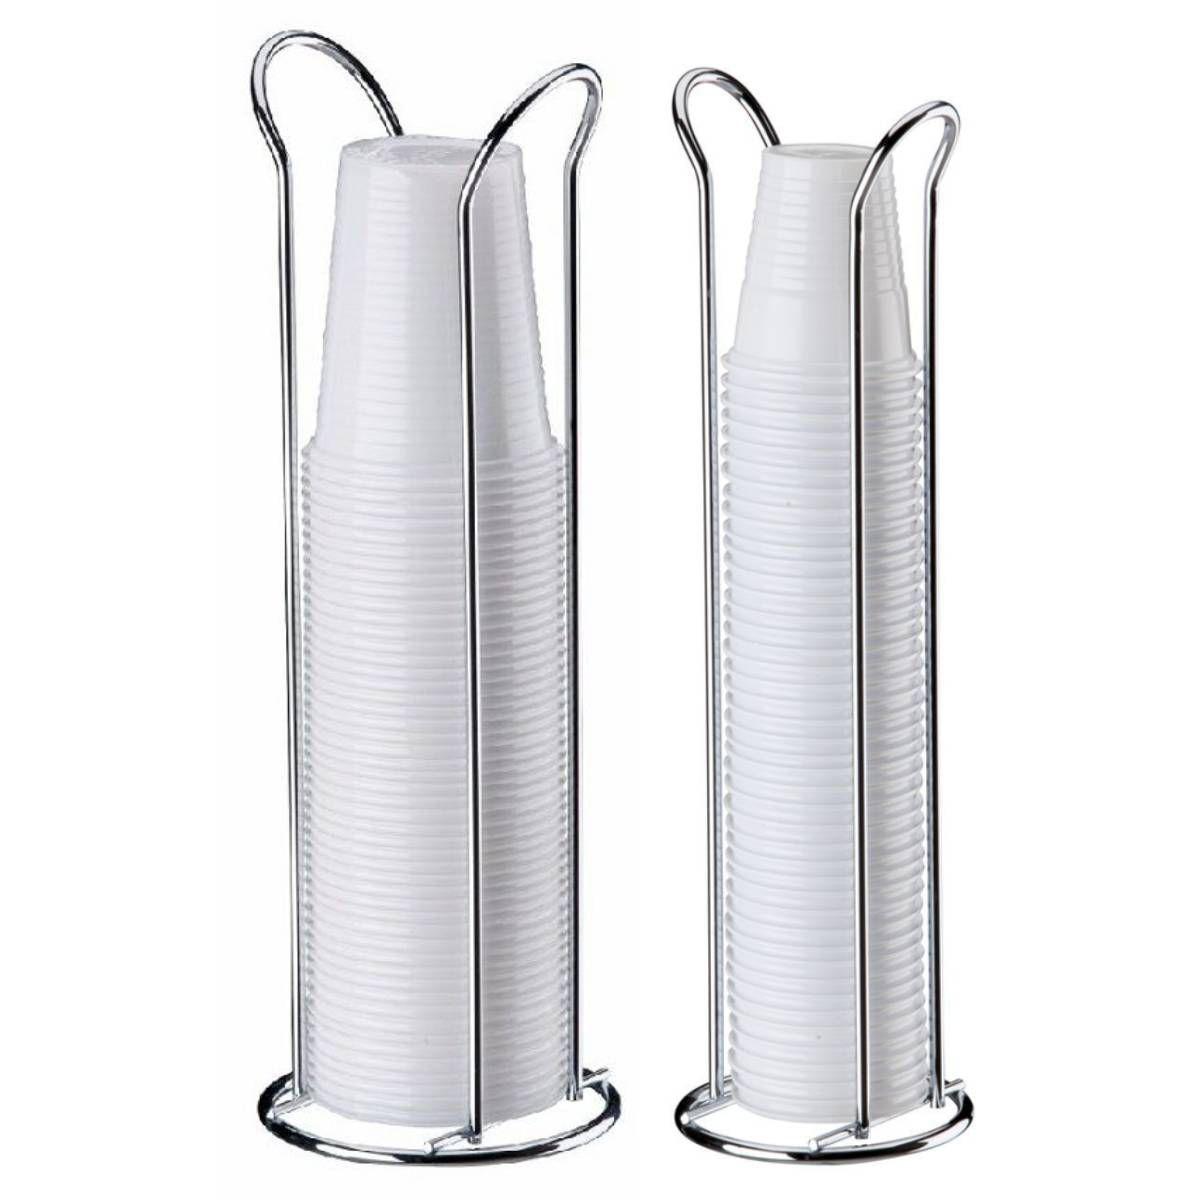 kit suporte de copos descartável de 200ml + suporte de 80ml